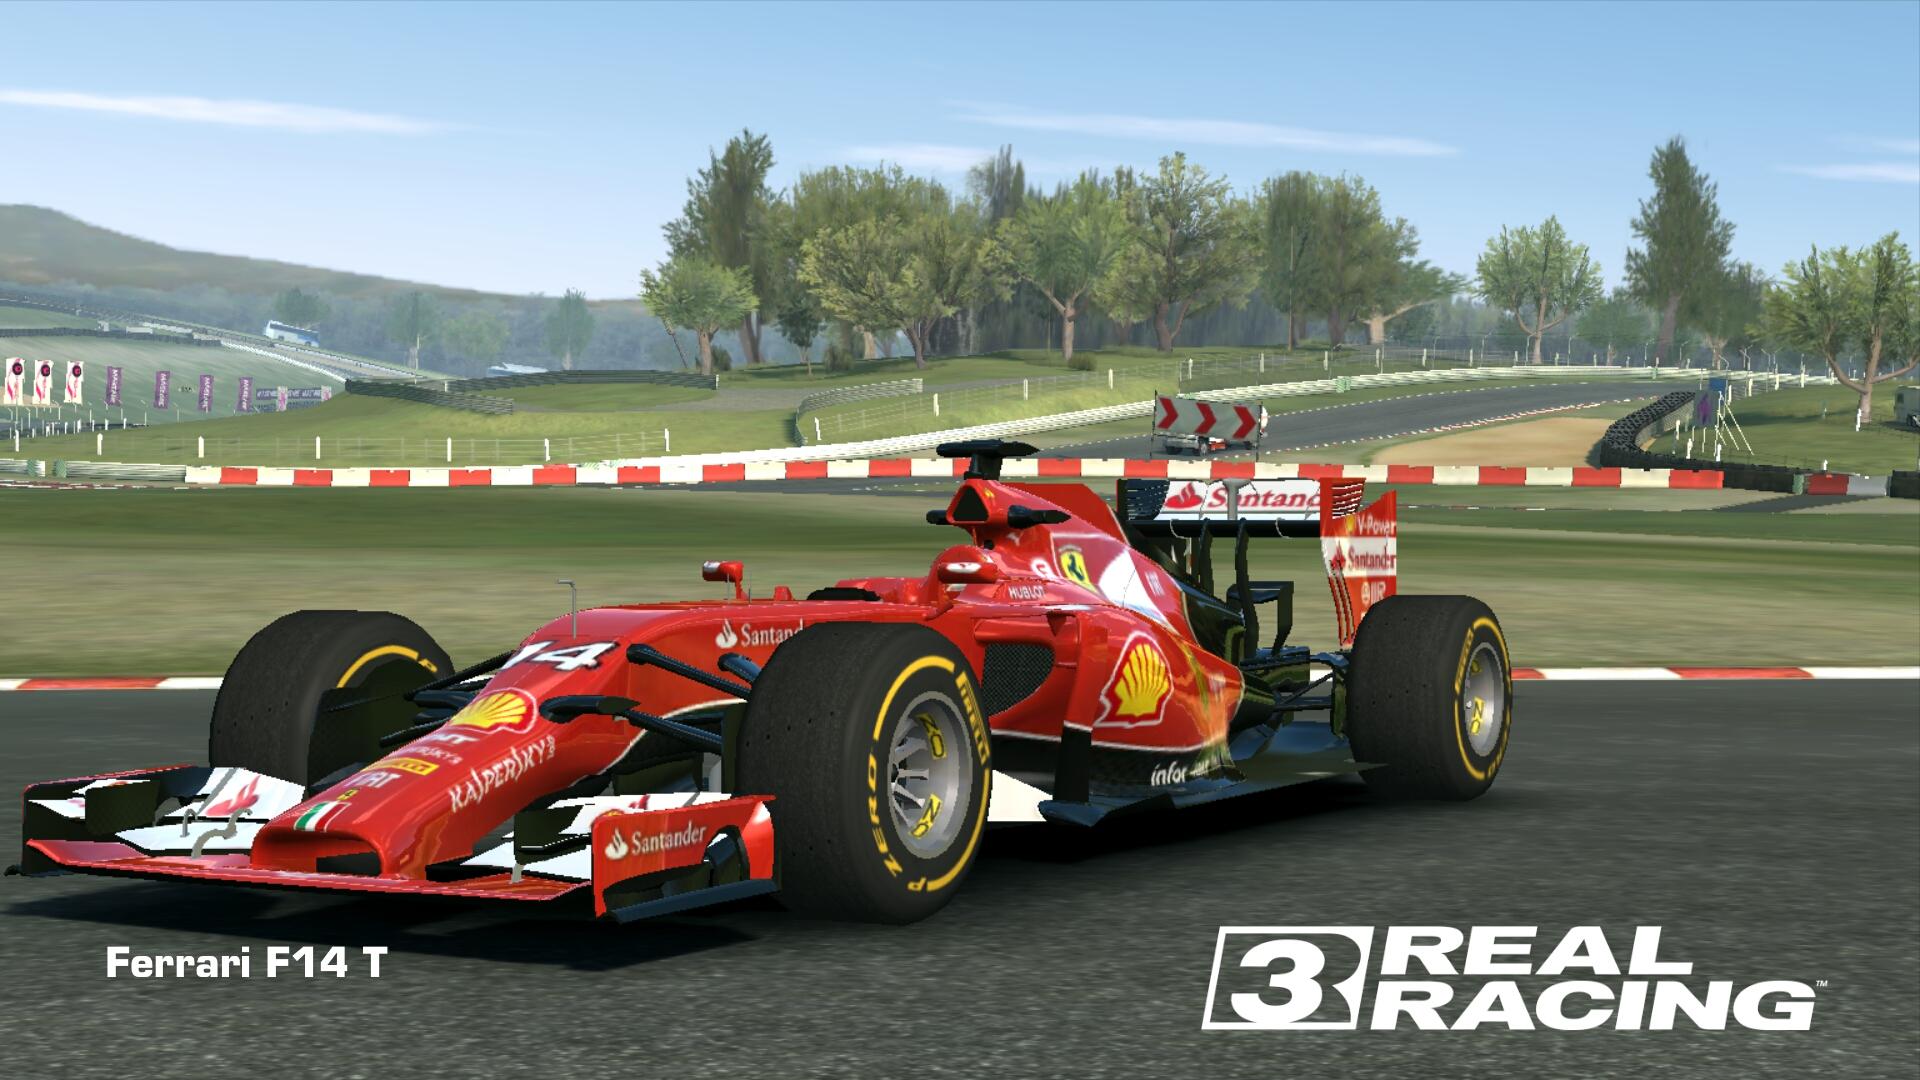 Showcase Ferrari F14 T